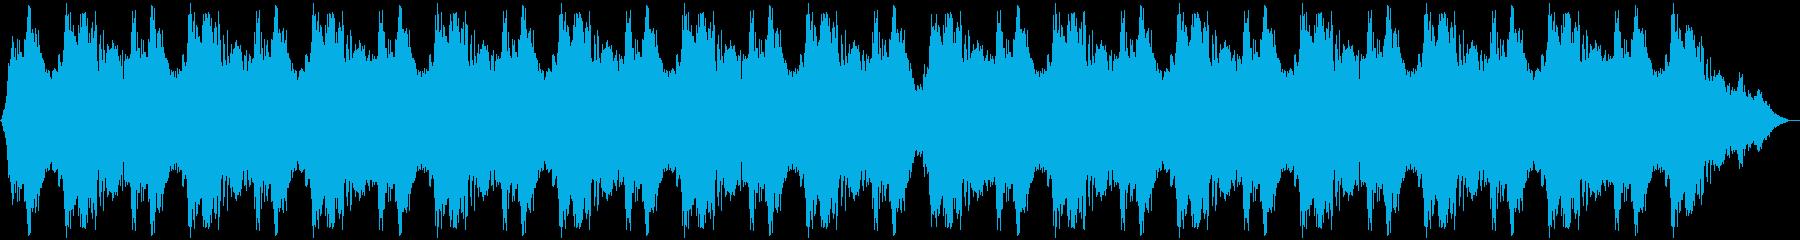 魔法詠唱、魔法発動、独白 19の再生済みの波形